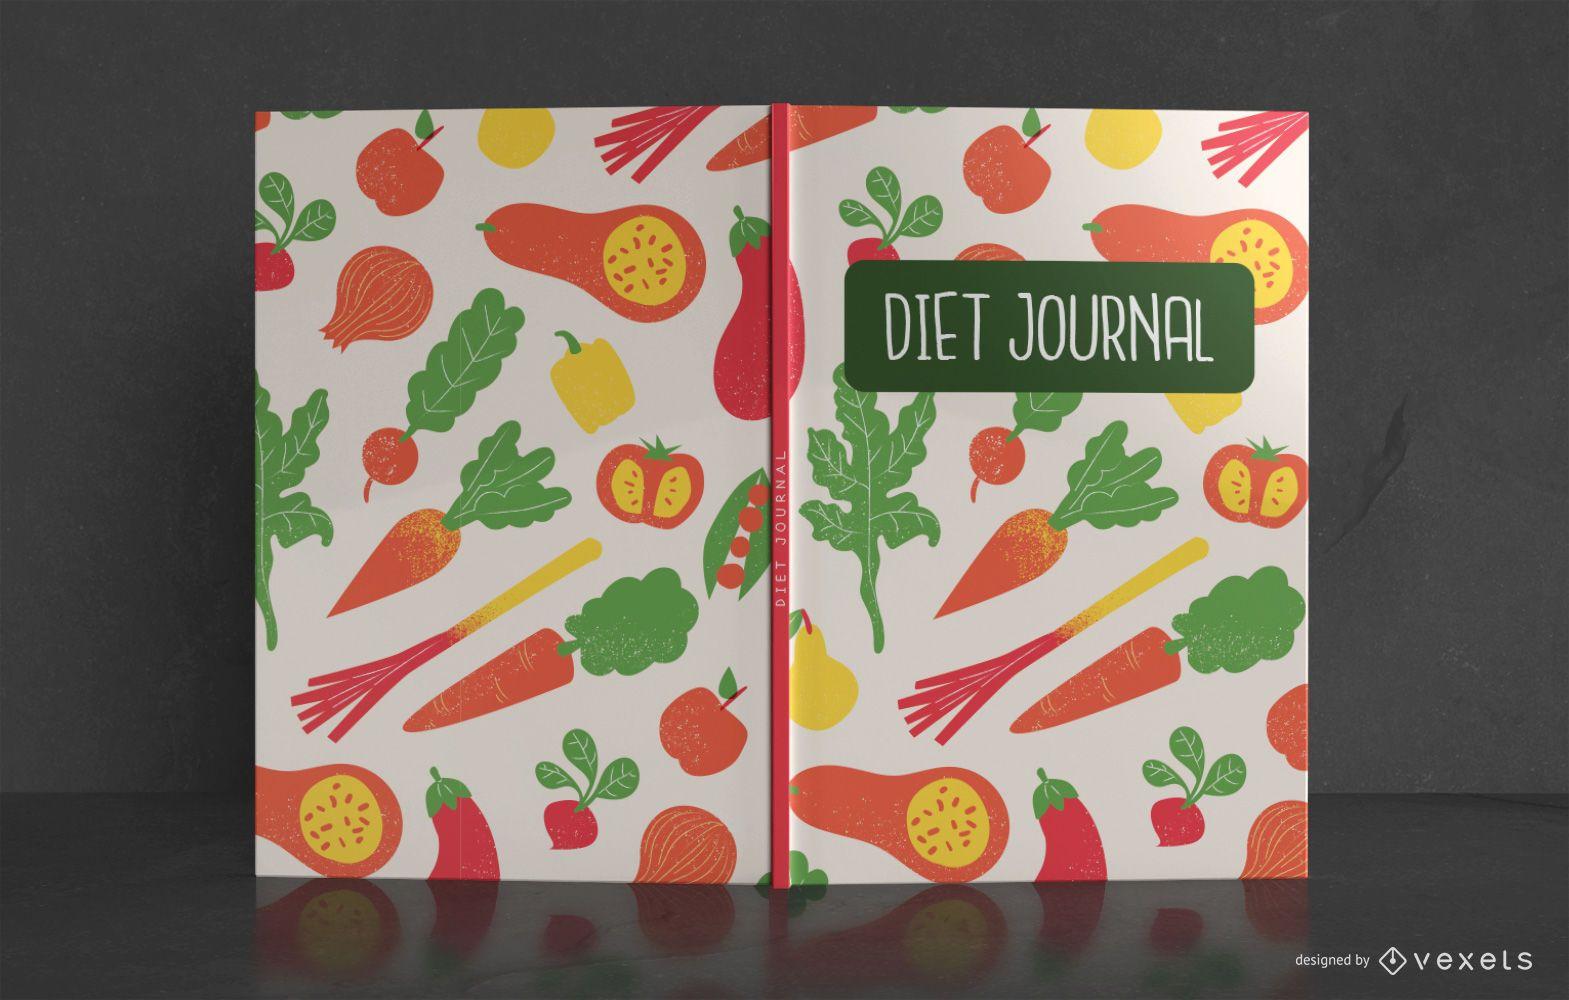 Diet Journal Pattern Book Cover Design